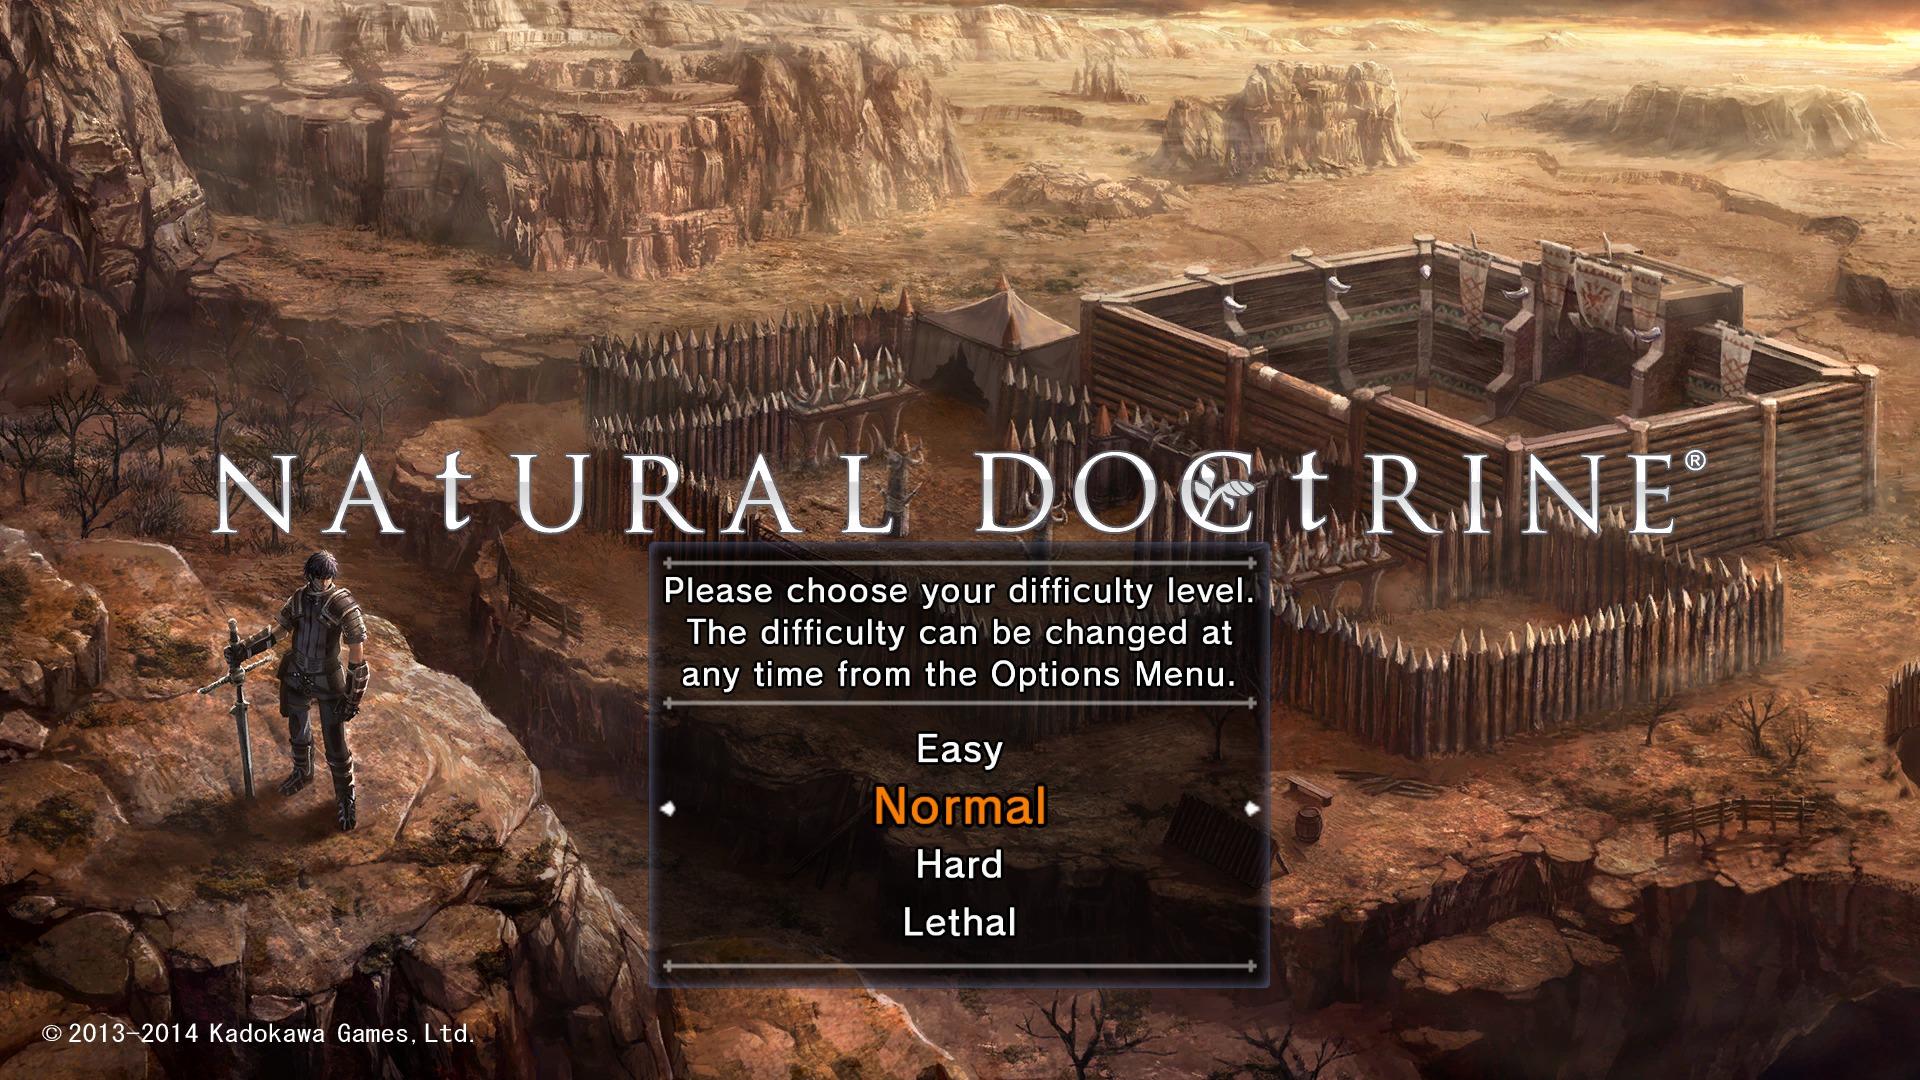 [GC14] Natural Doctrine